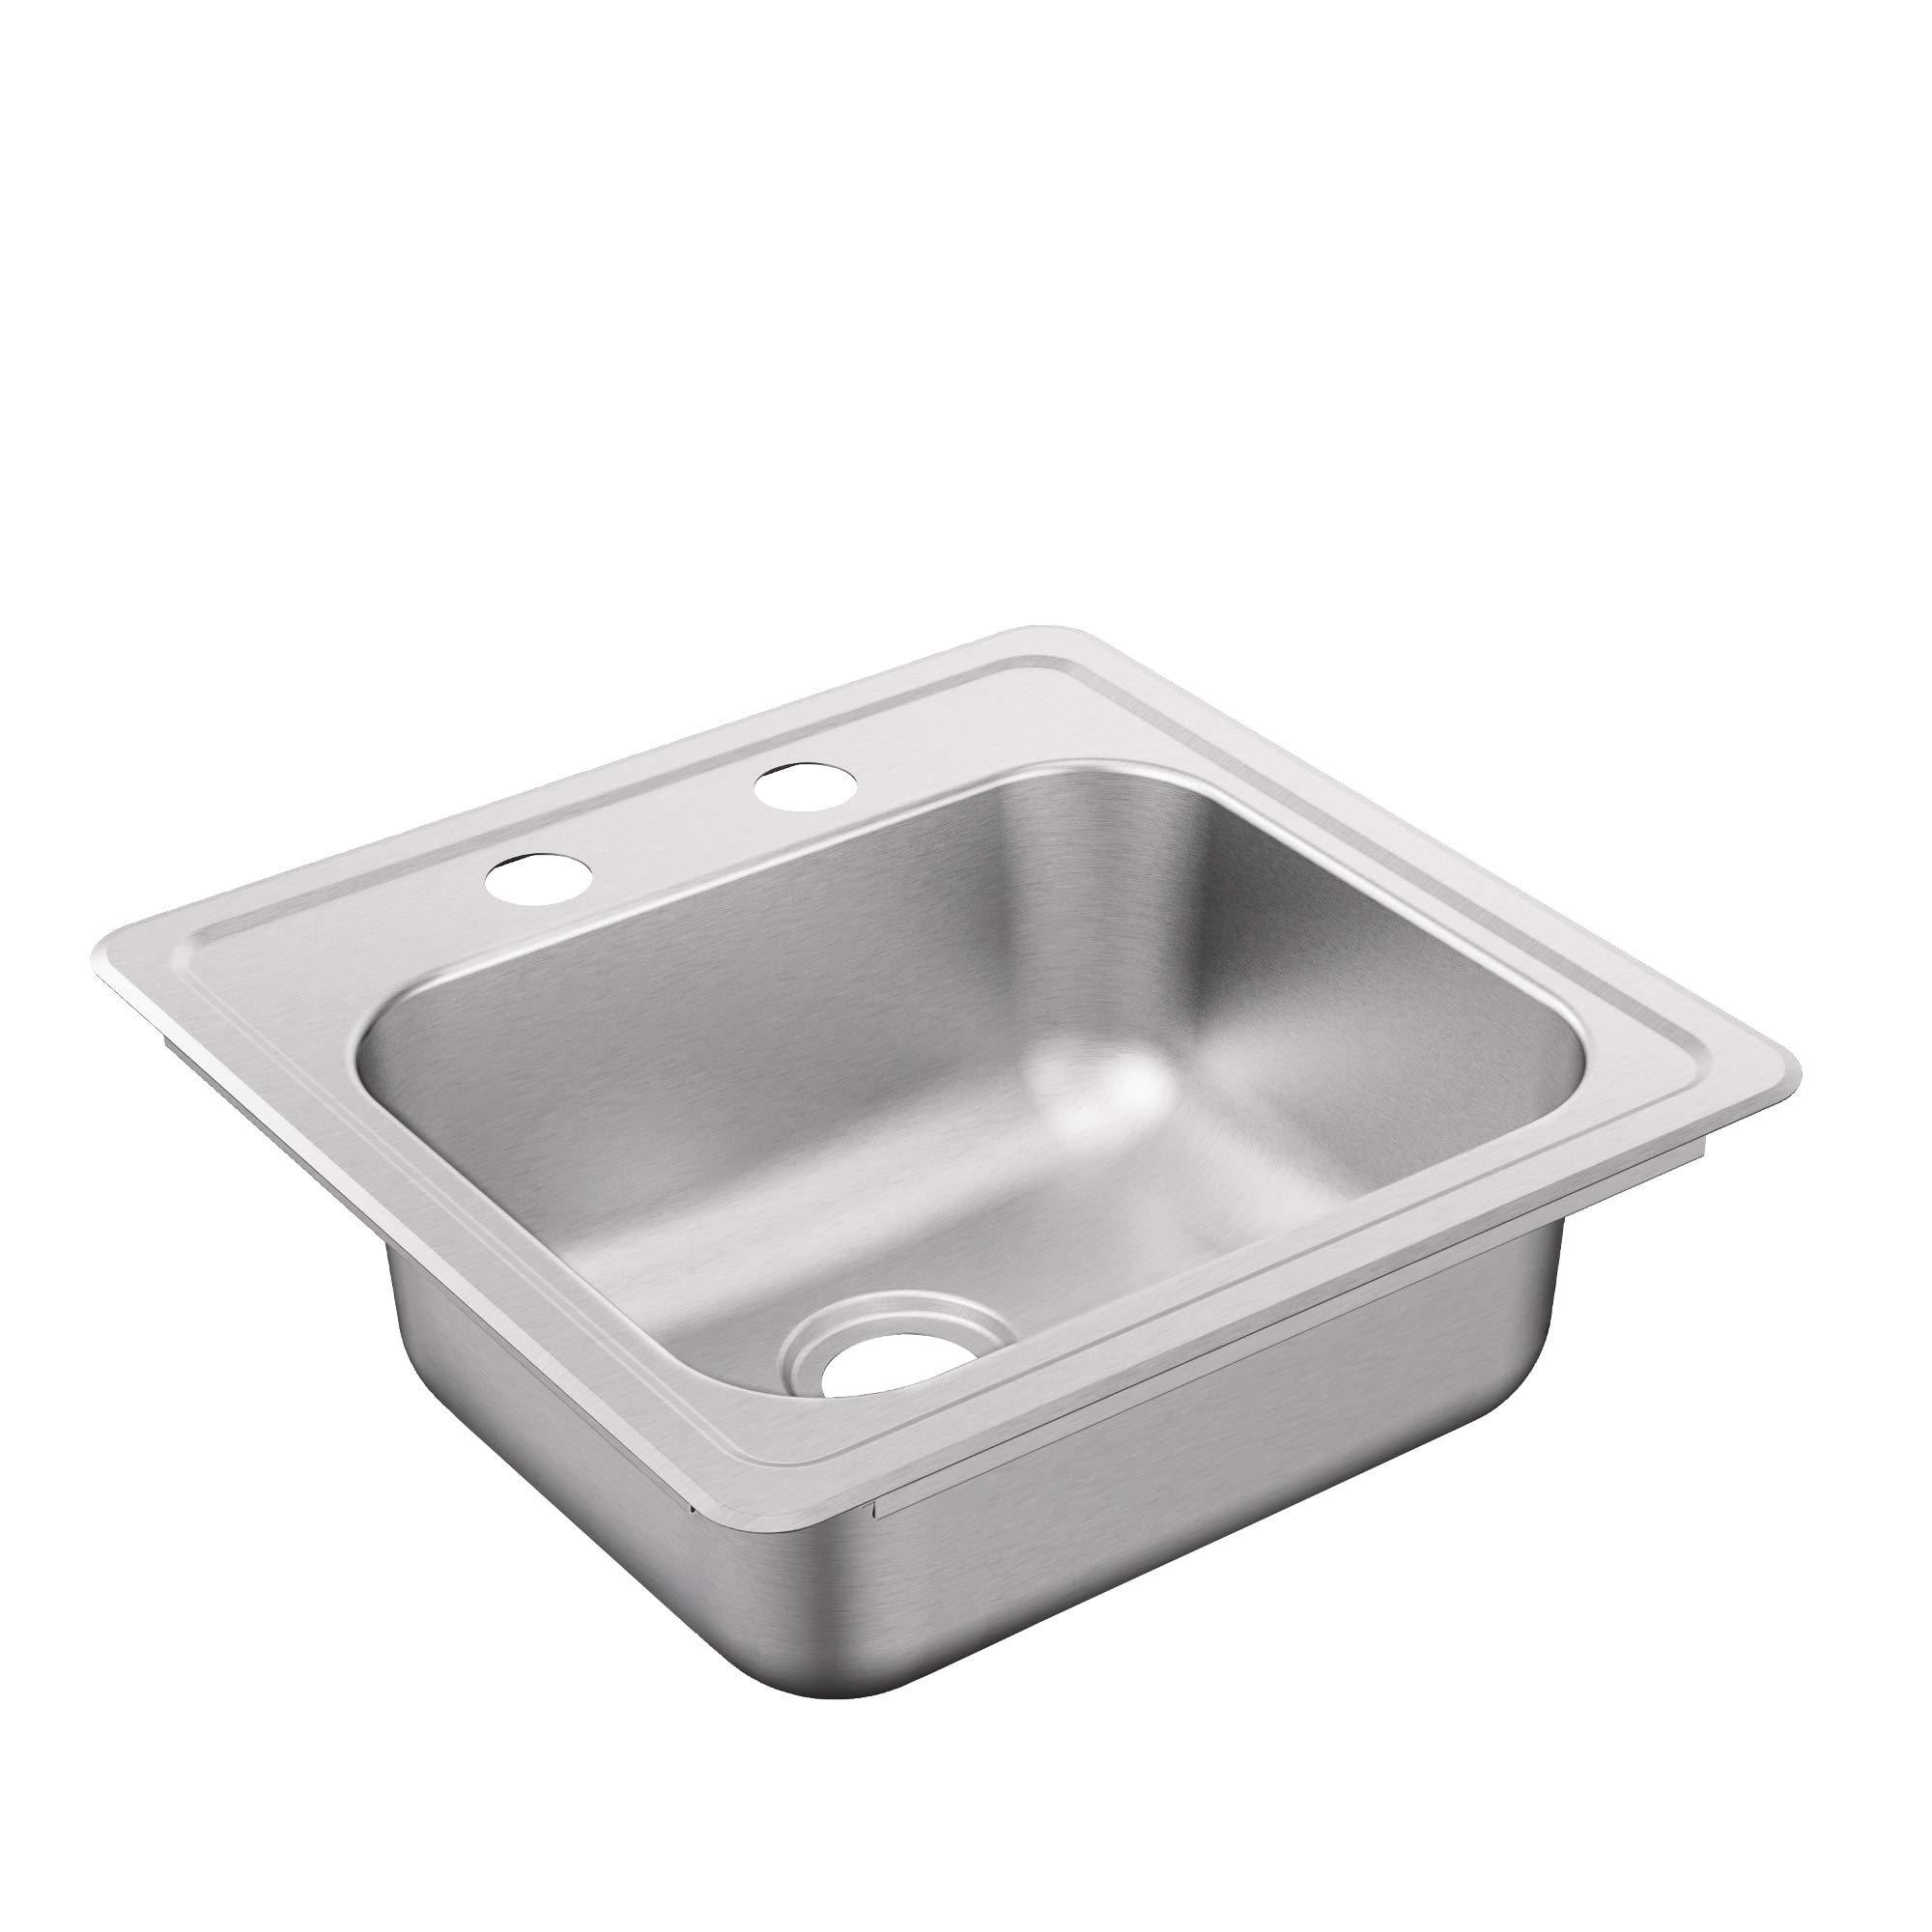 Moen G2245622B 2200 Series Sink, Brushed/Satin Stainless by Moen